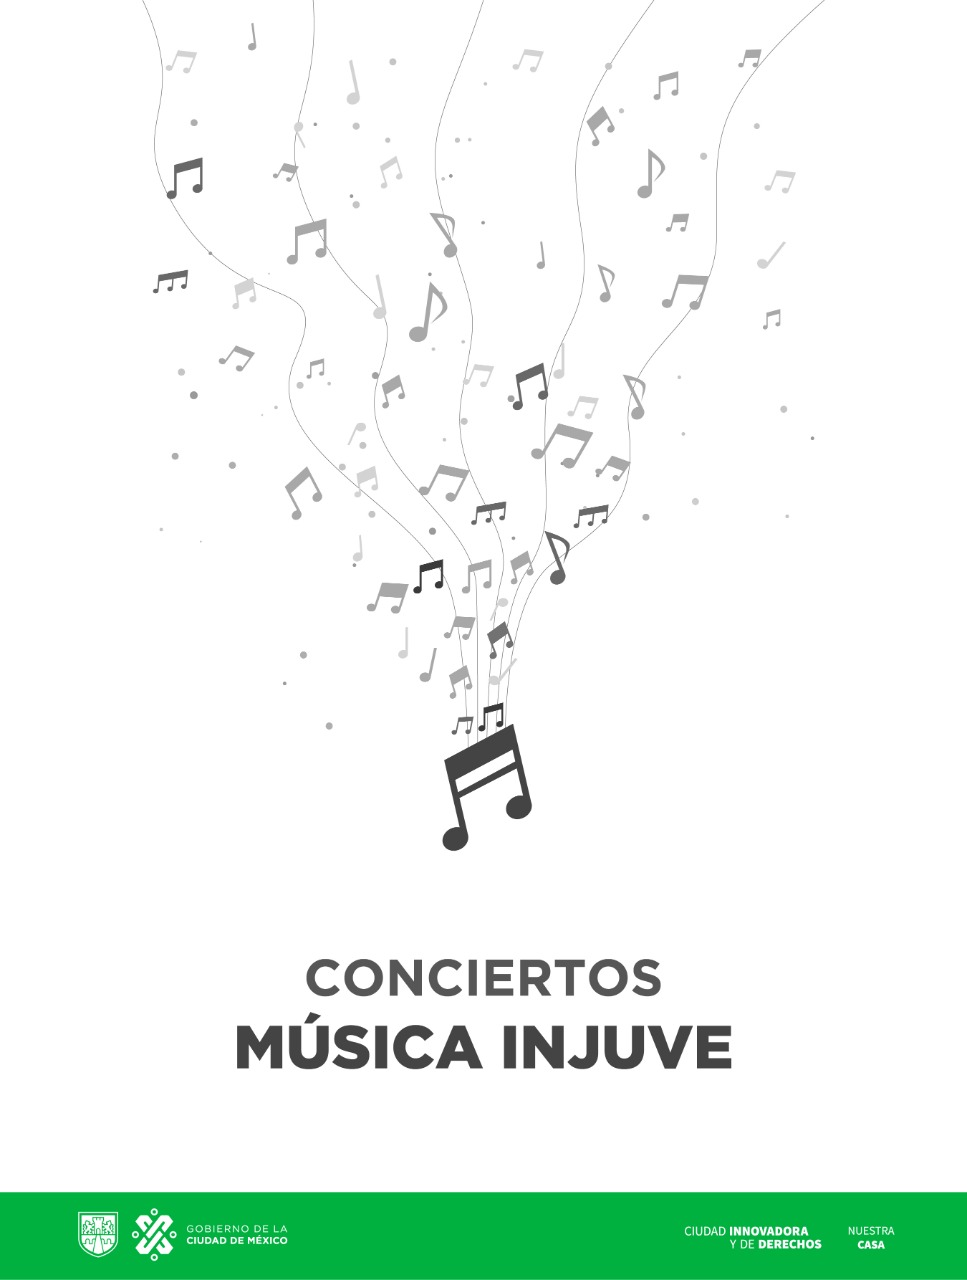 Conciertos_injuve.jpeg